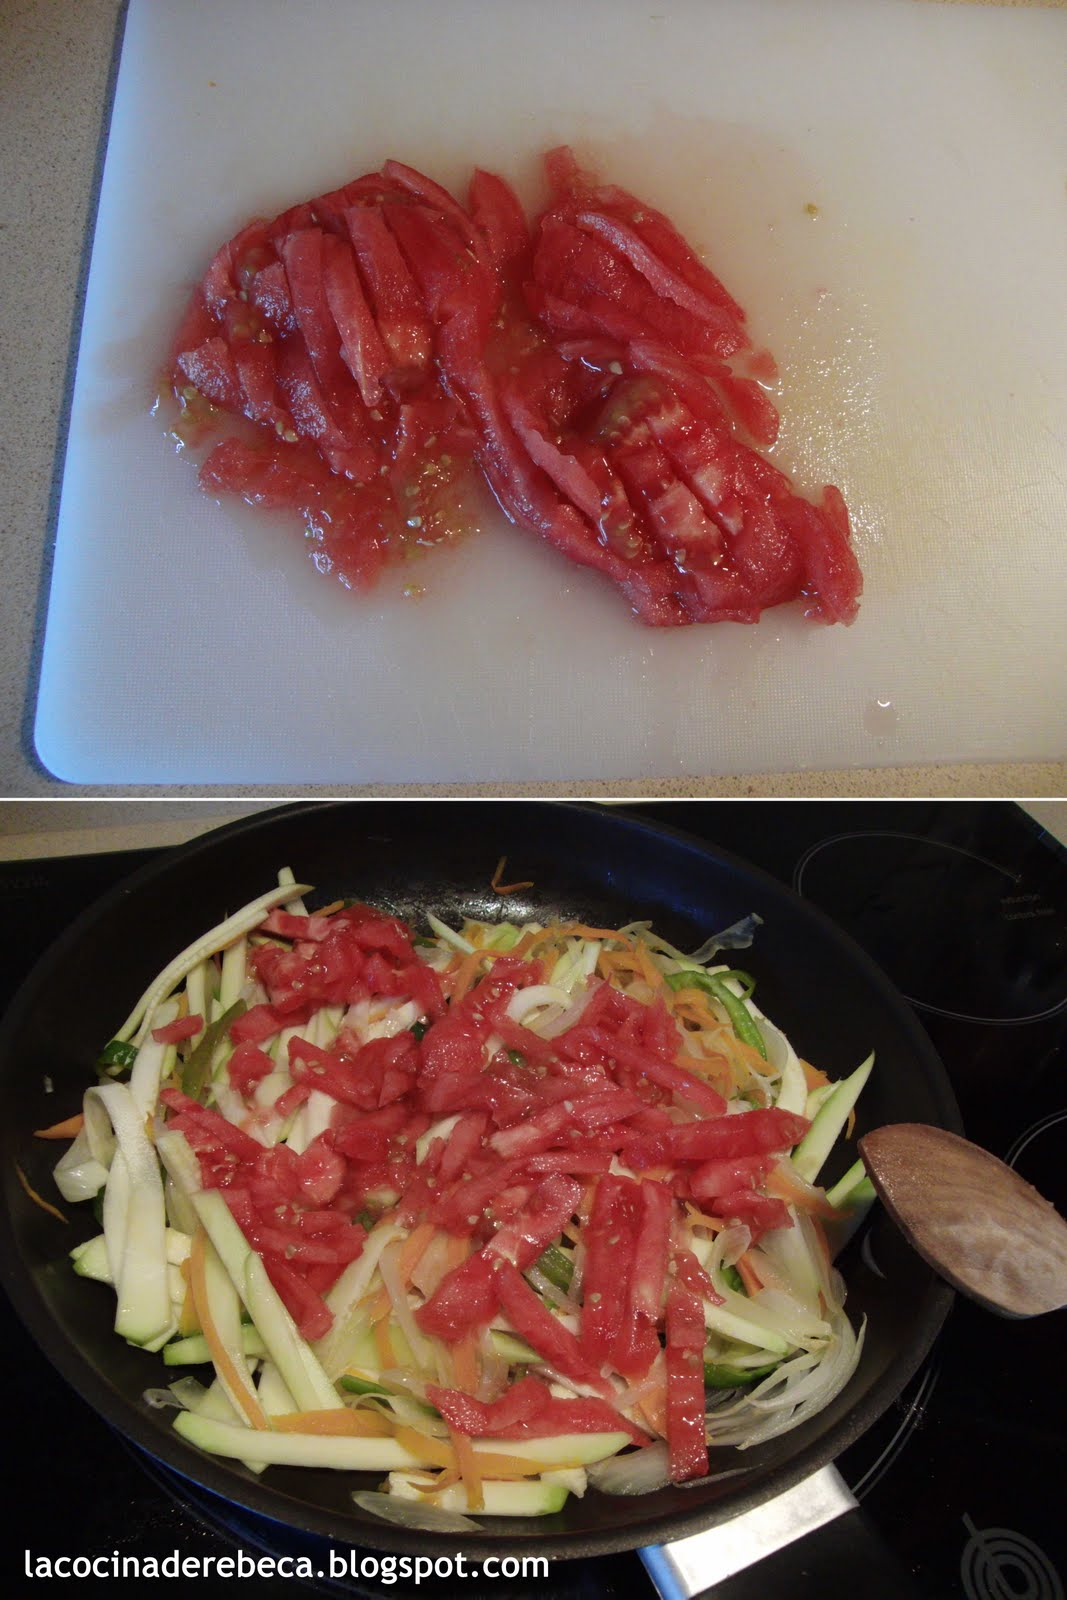 La cocina de rebeca merluza en papillote - Merluza a la papillote ...